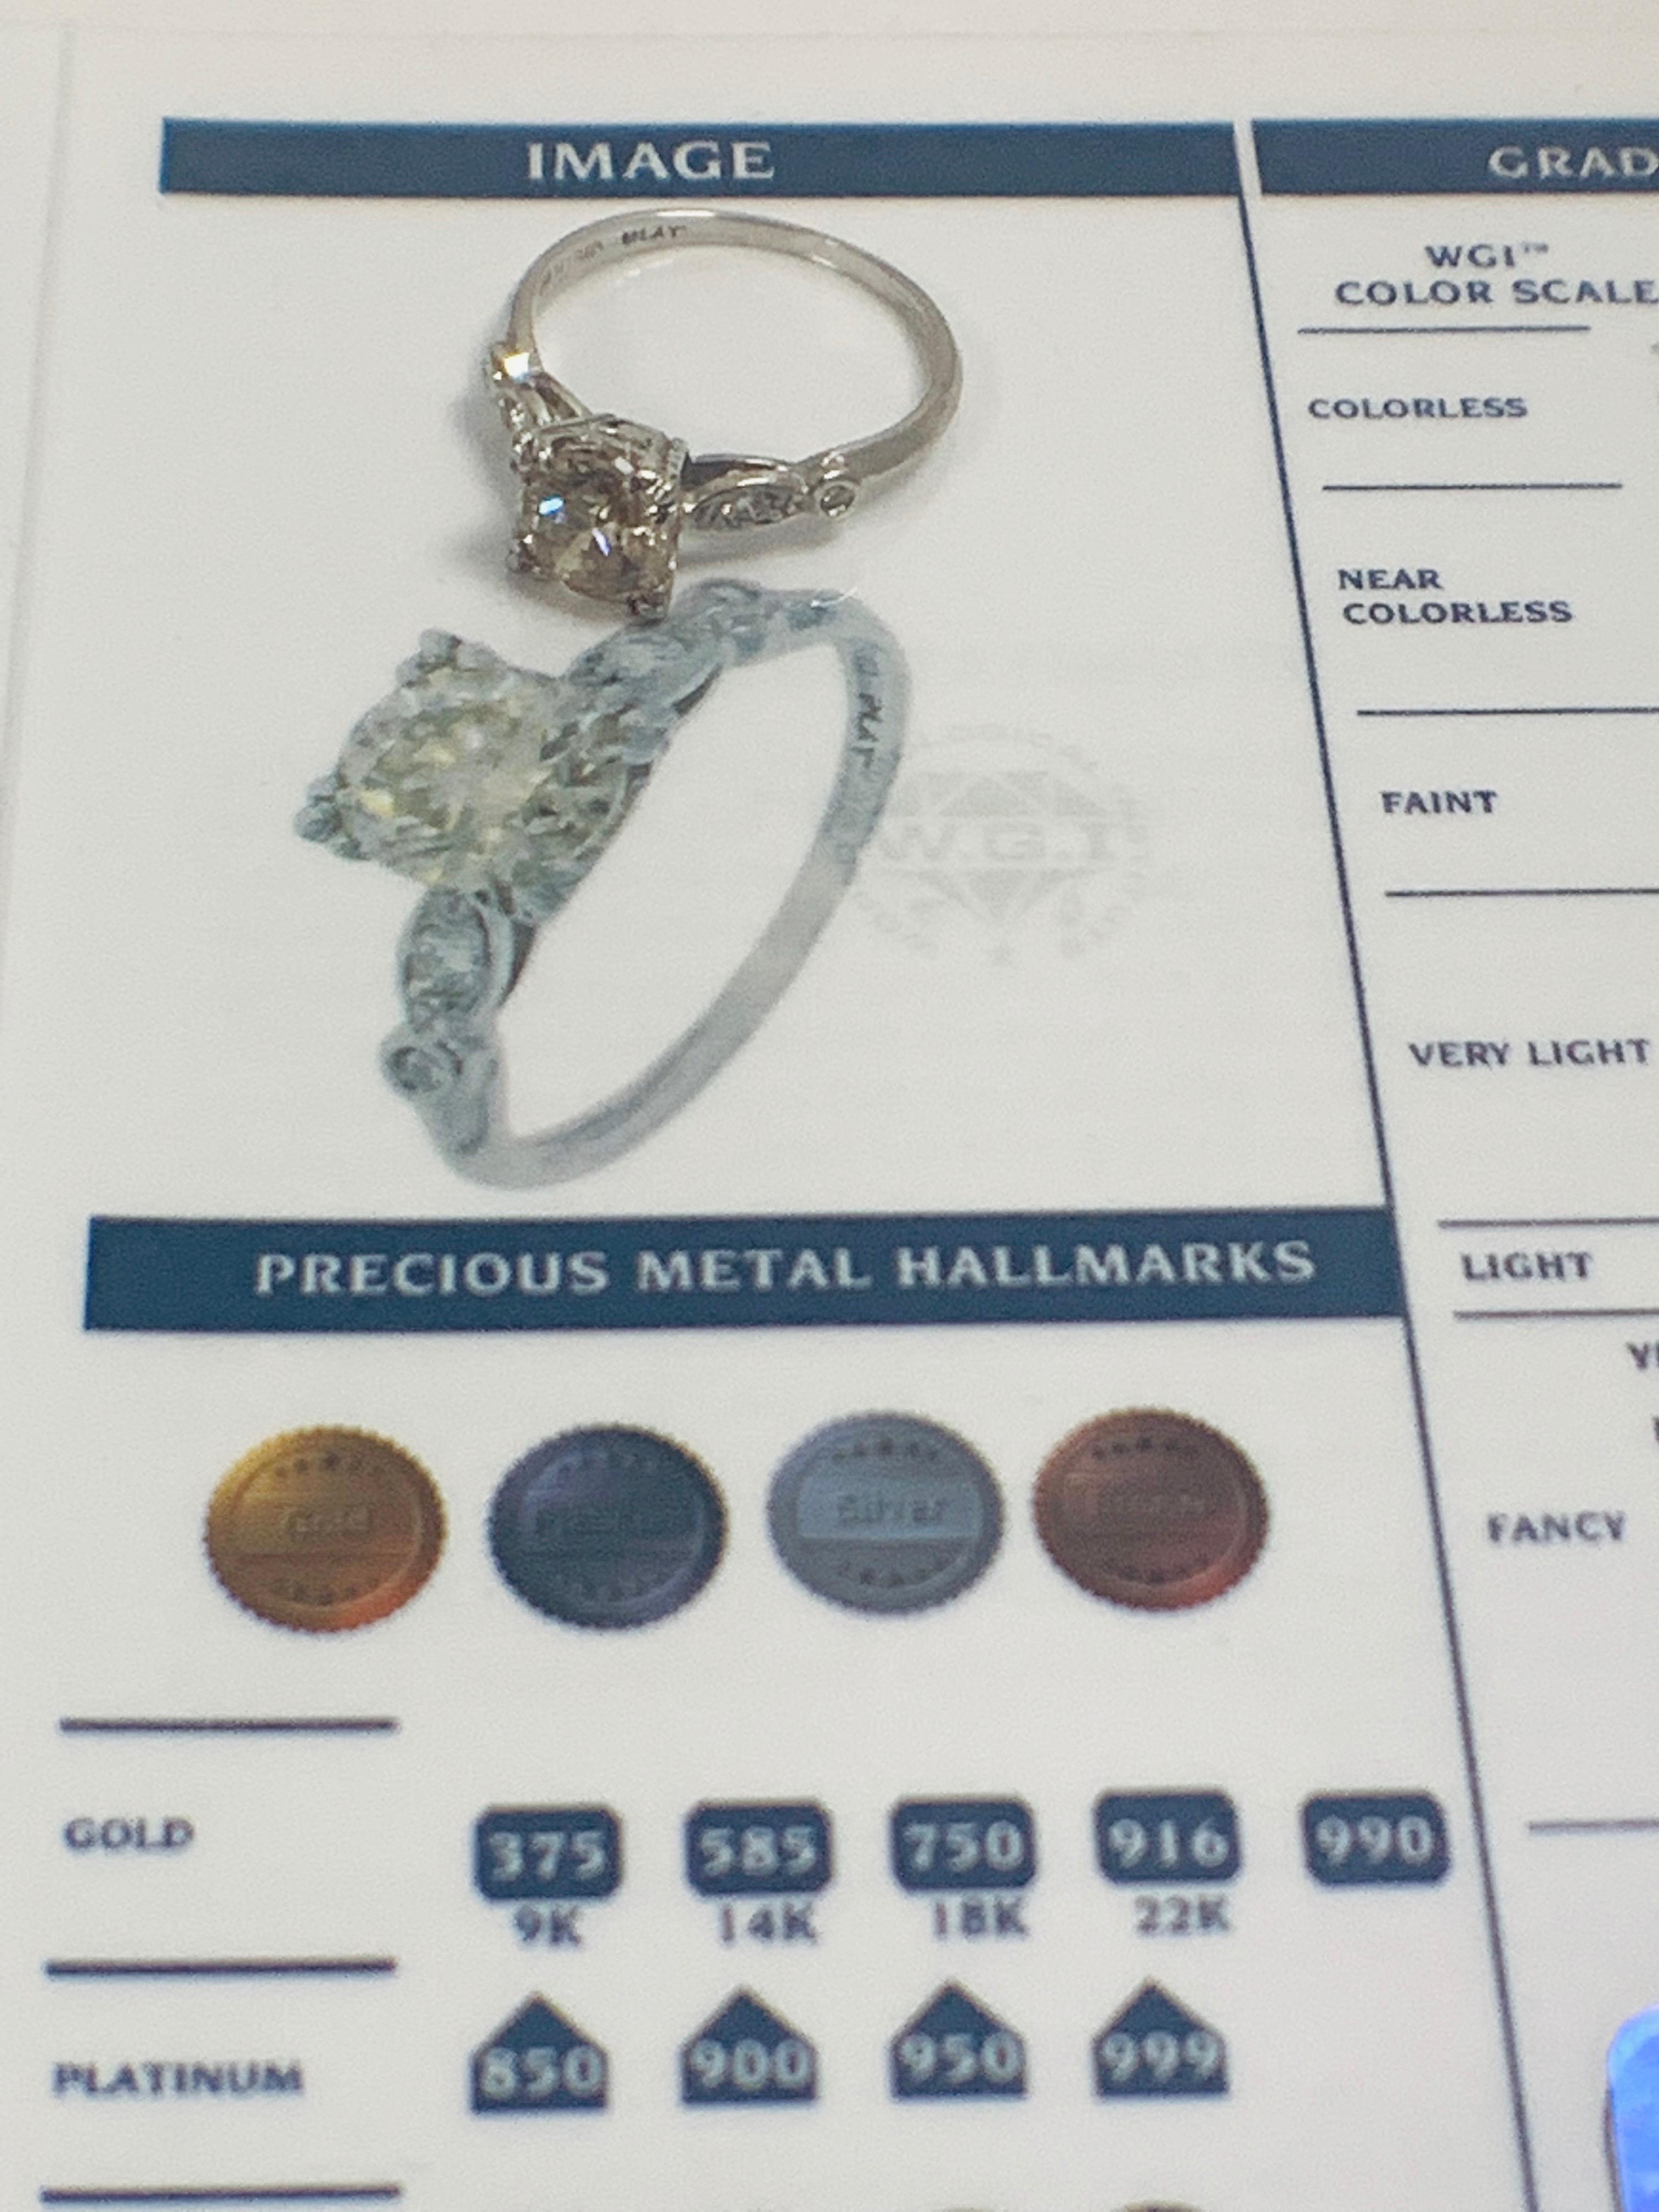 Platinum Diamond ring featuring centre, round brilliant cut, fancy light brown Diamond (1.55ct) - Image 12 of 14